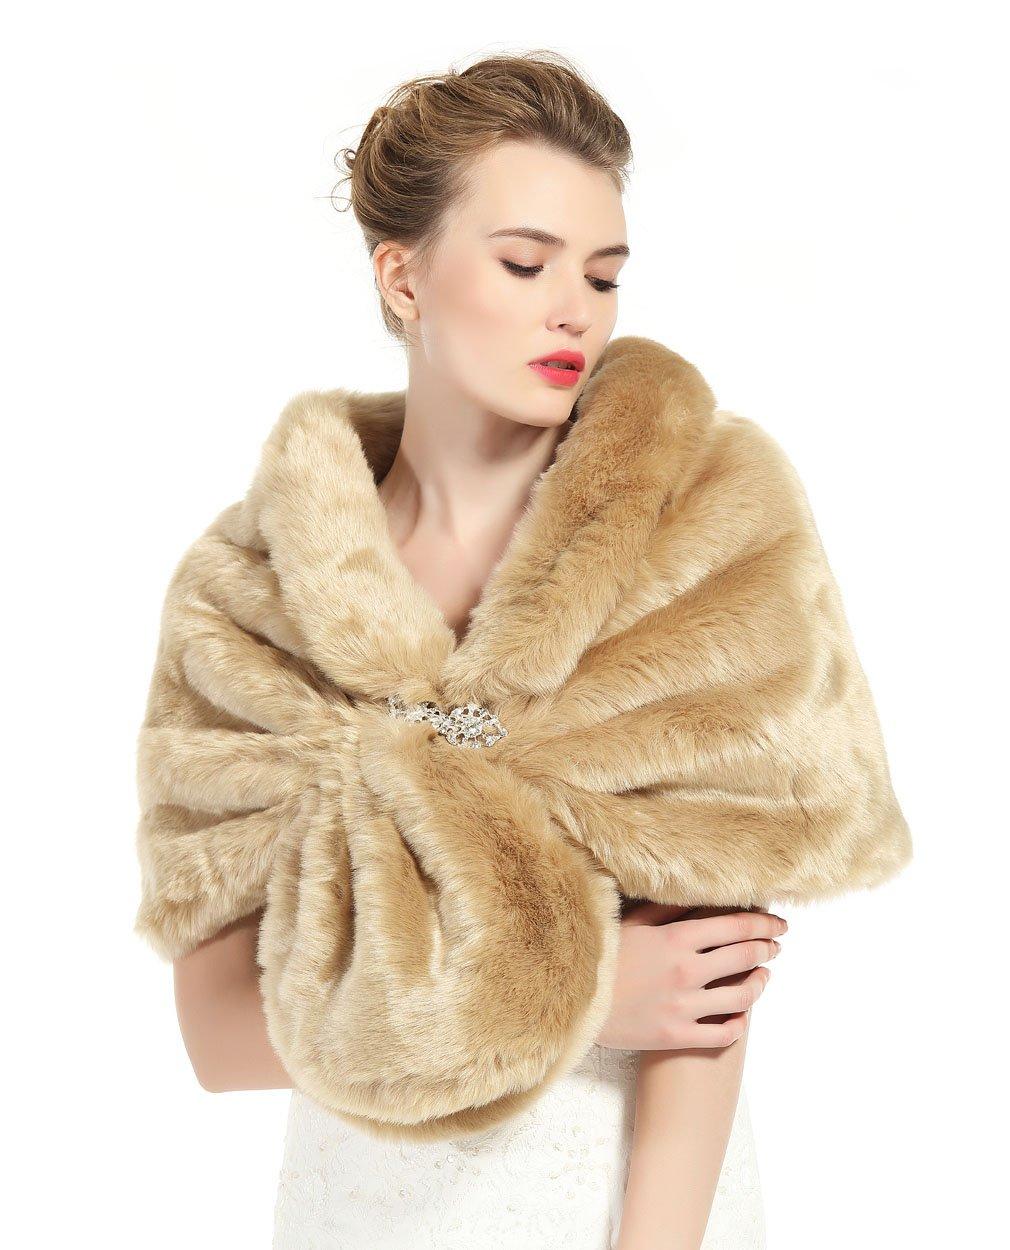 Faux Fur Shawl Wrap Stole Shrug Winter Bridal Wedding Cover Up Khaki Size M